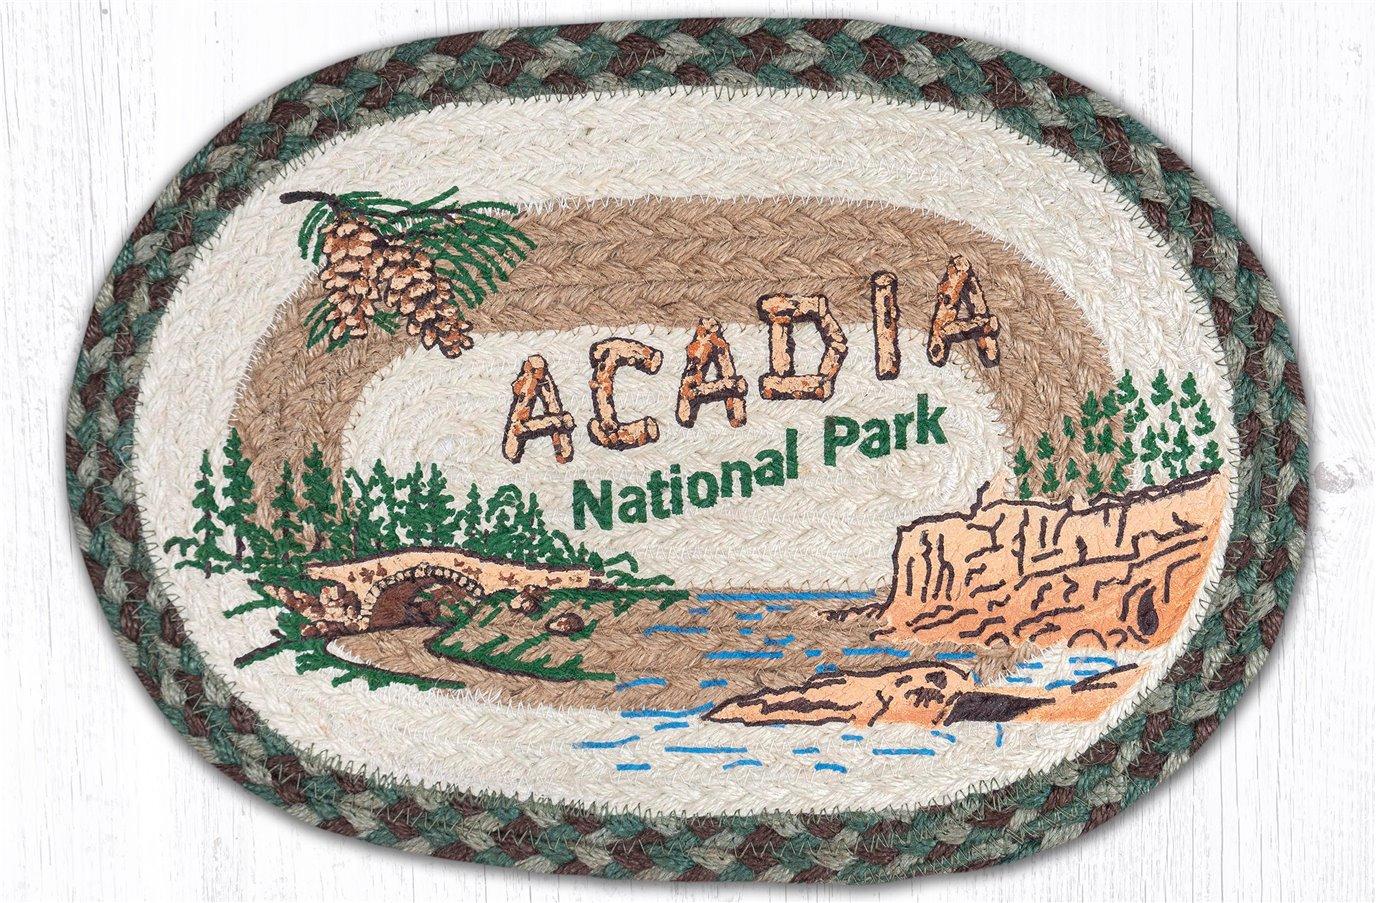 "Acadia Bridge Printed Oval Braided Swatch 10""x15"""